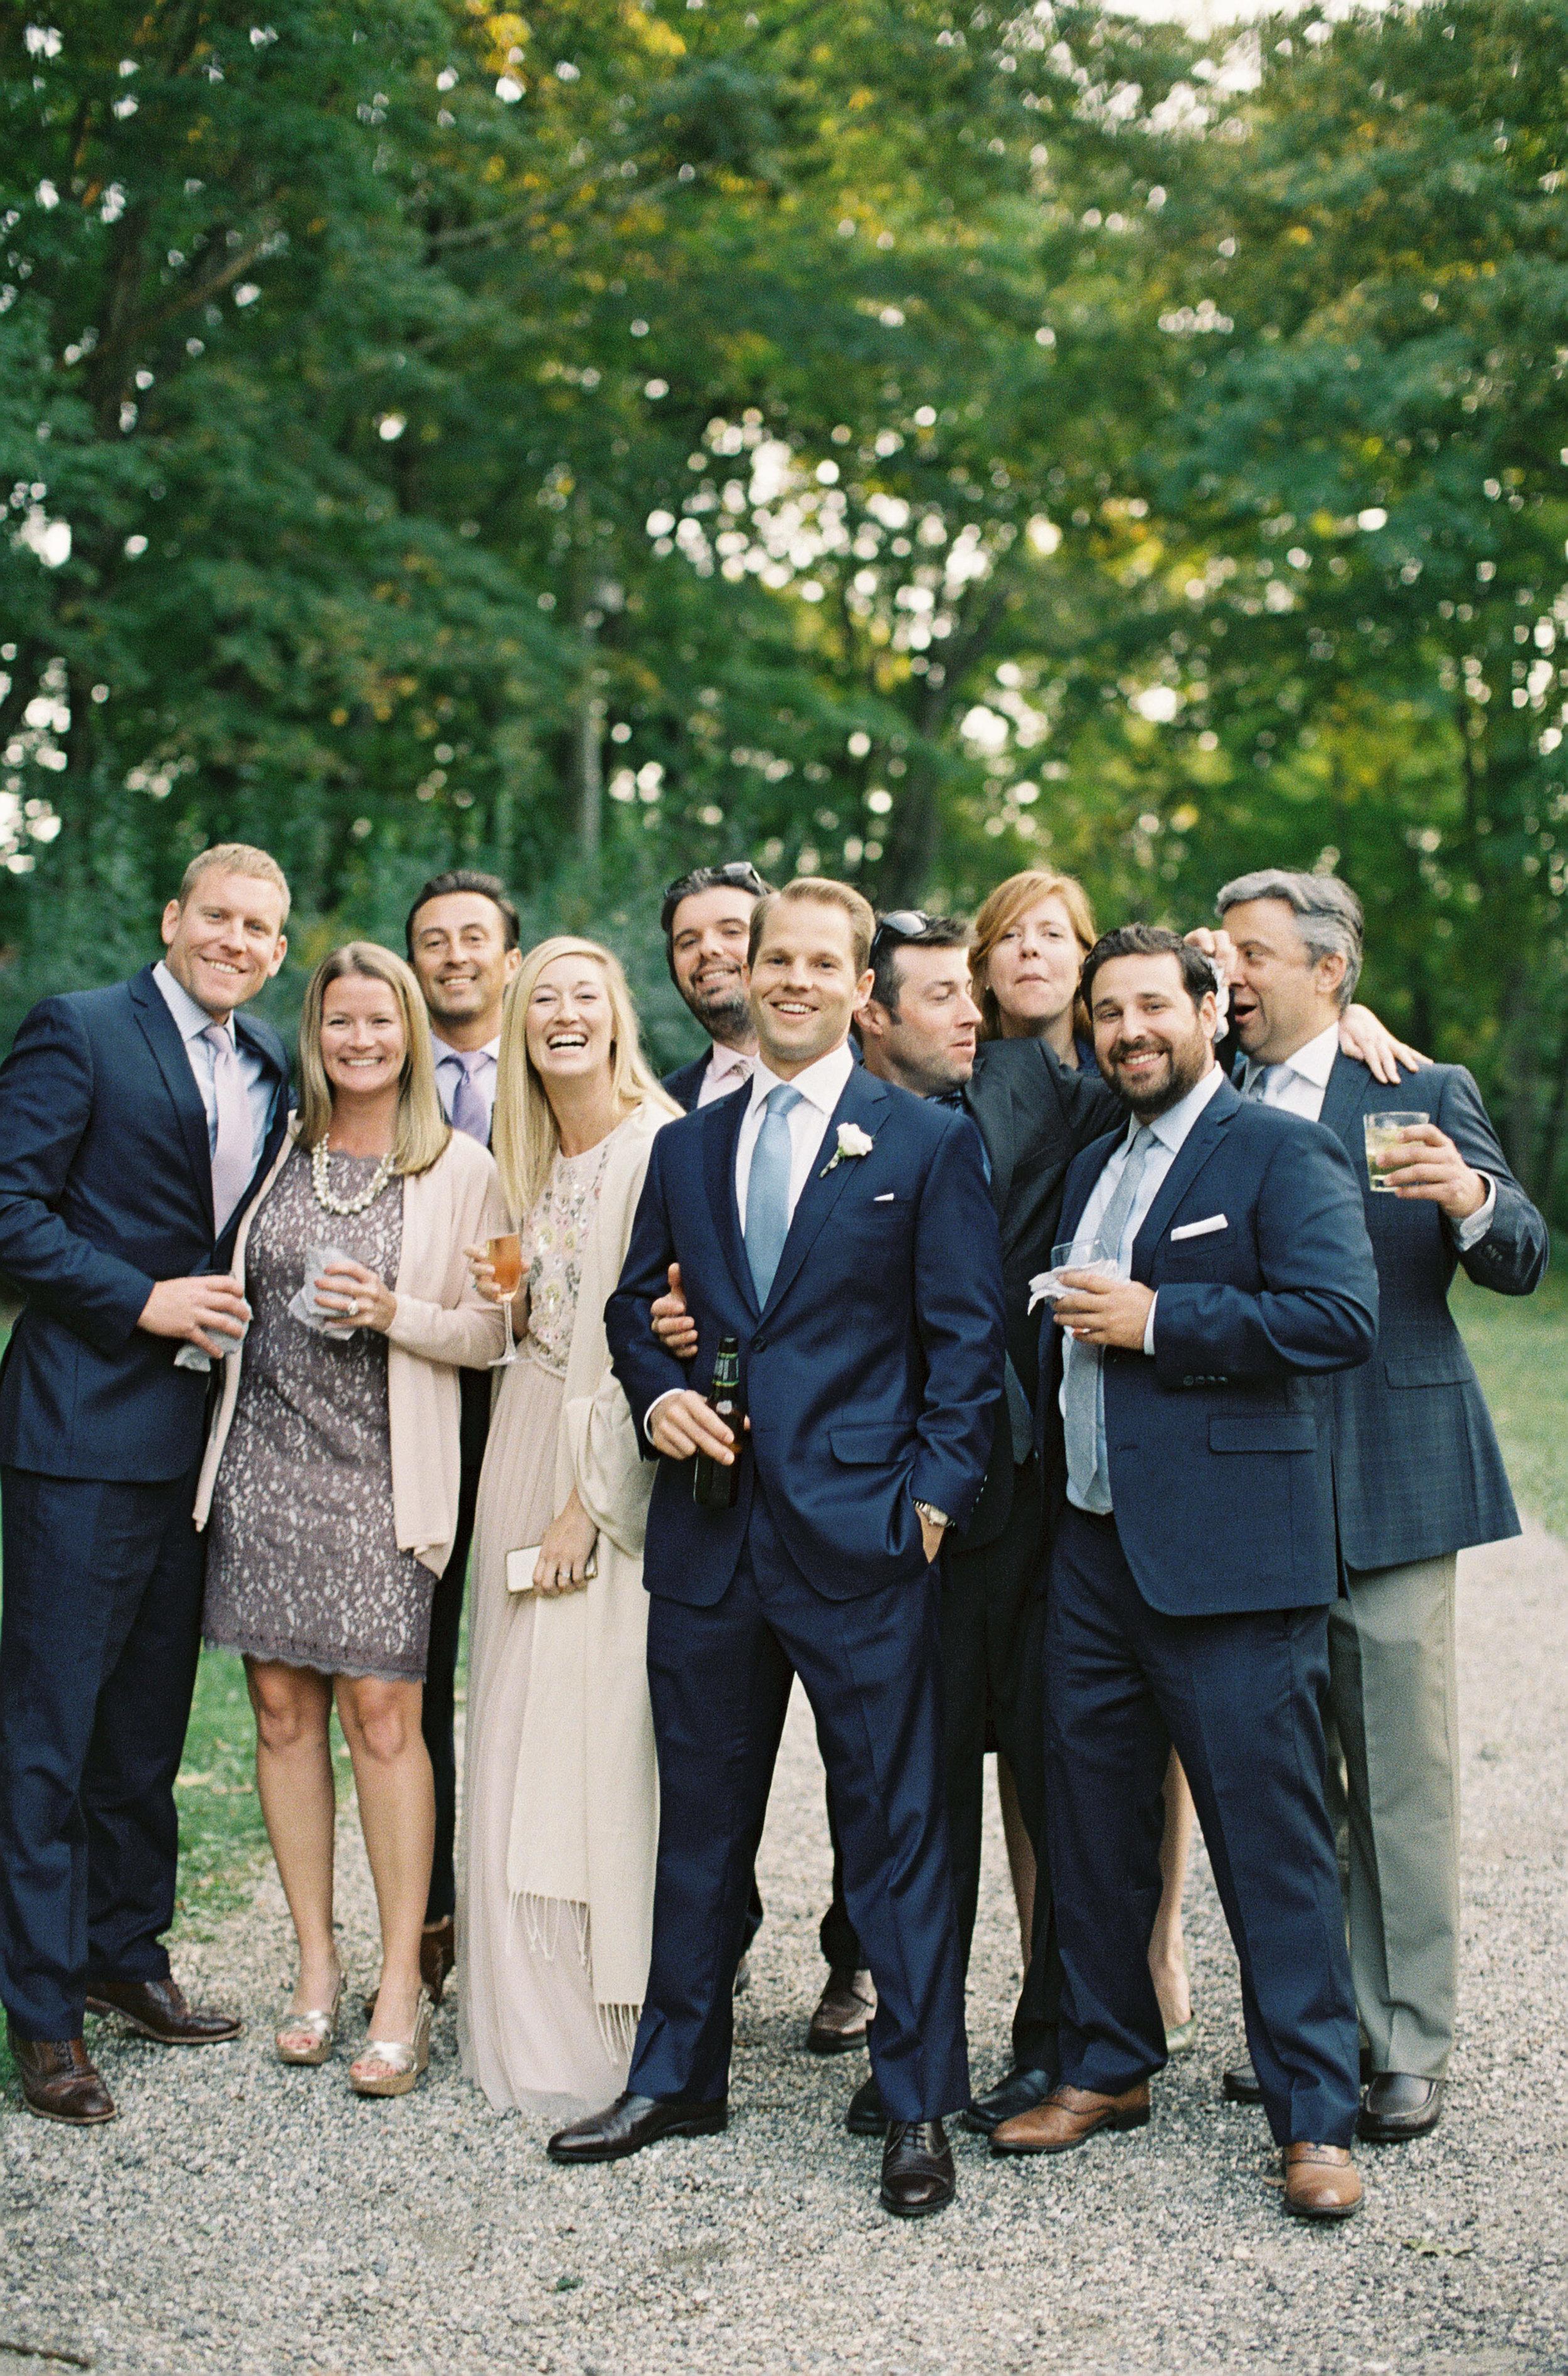 Connecticut-Wedding-40-Jen-Huang-20170909-KB-109-Jen_Huang-006795-R1-014.jpg